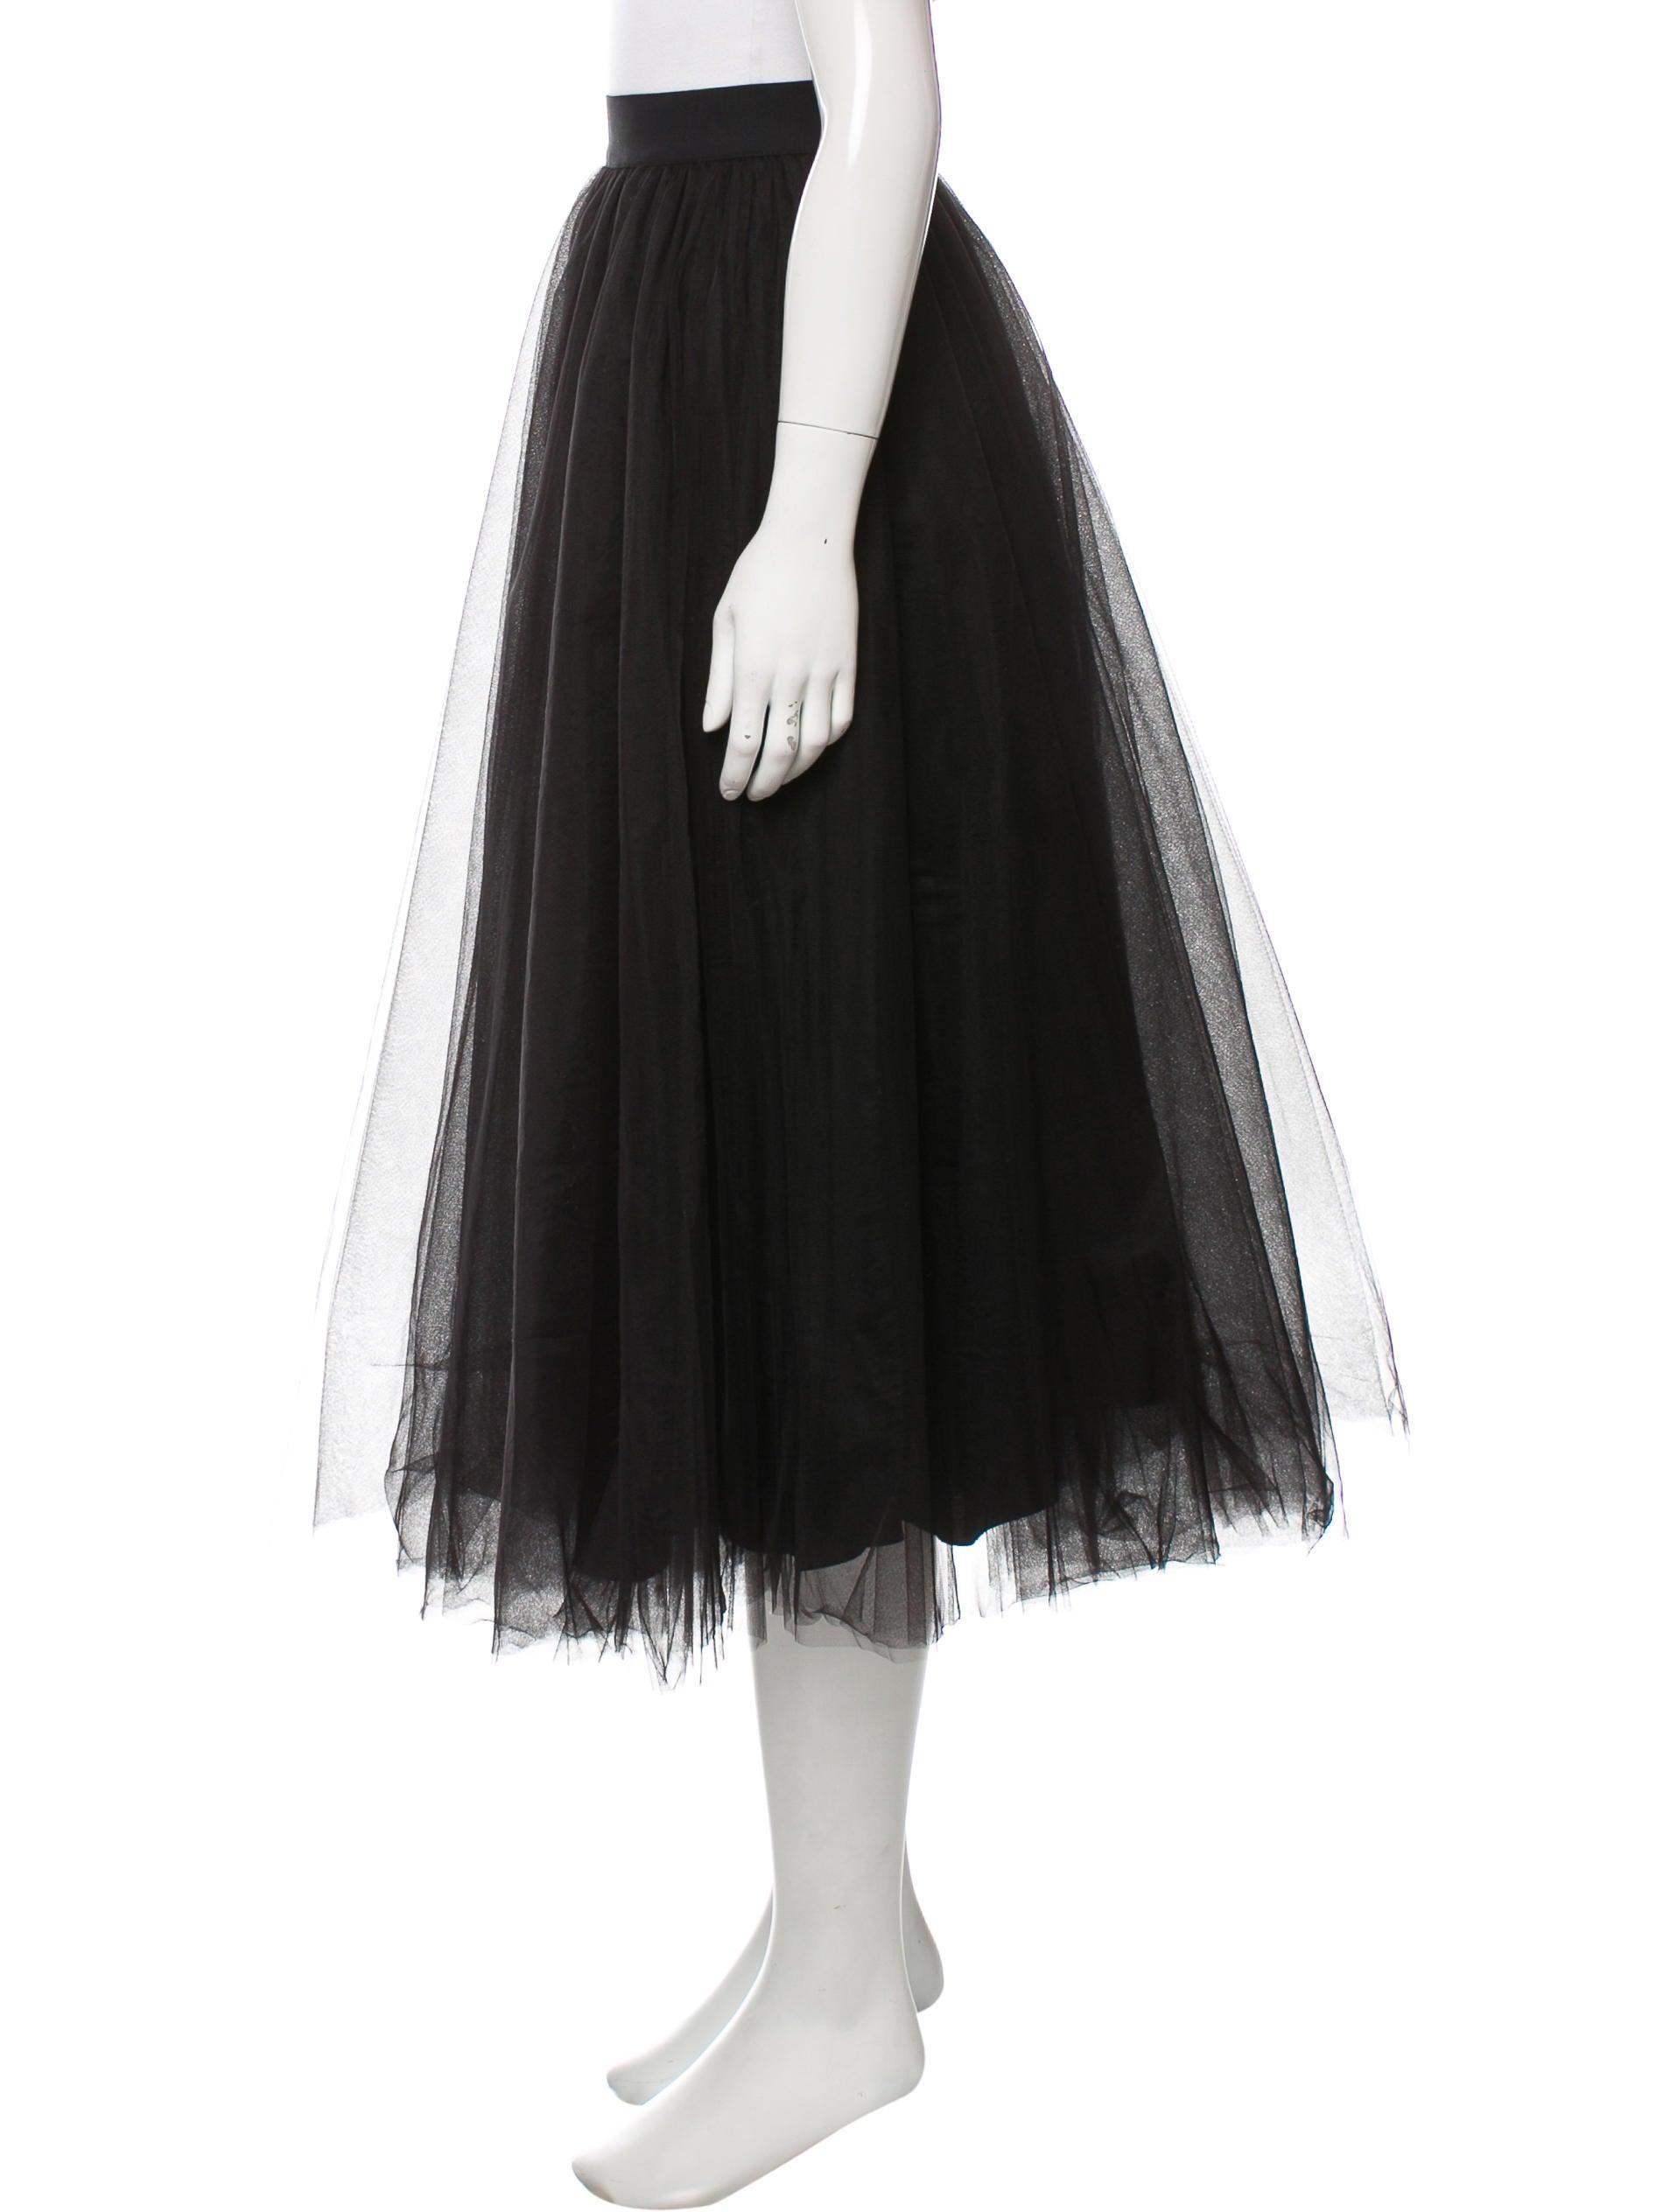 badgley mischka tulle midi skirt clothing bag21124